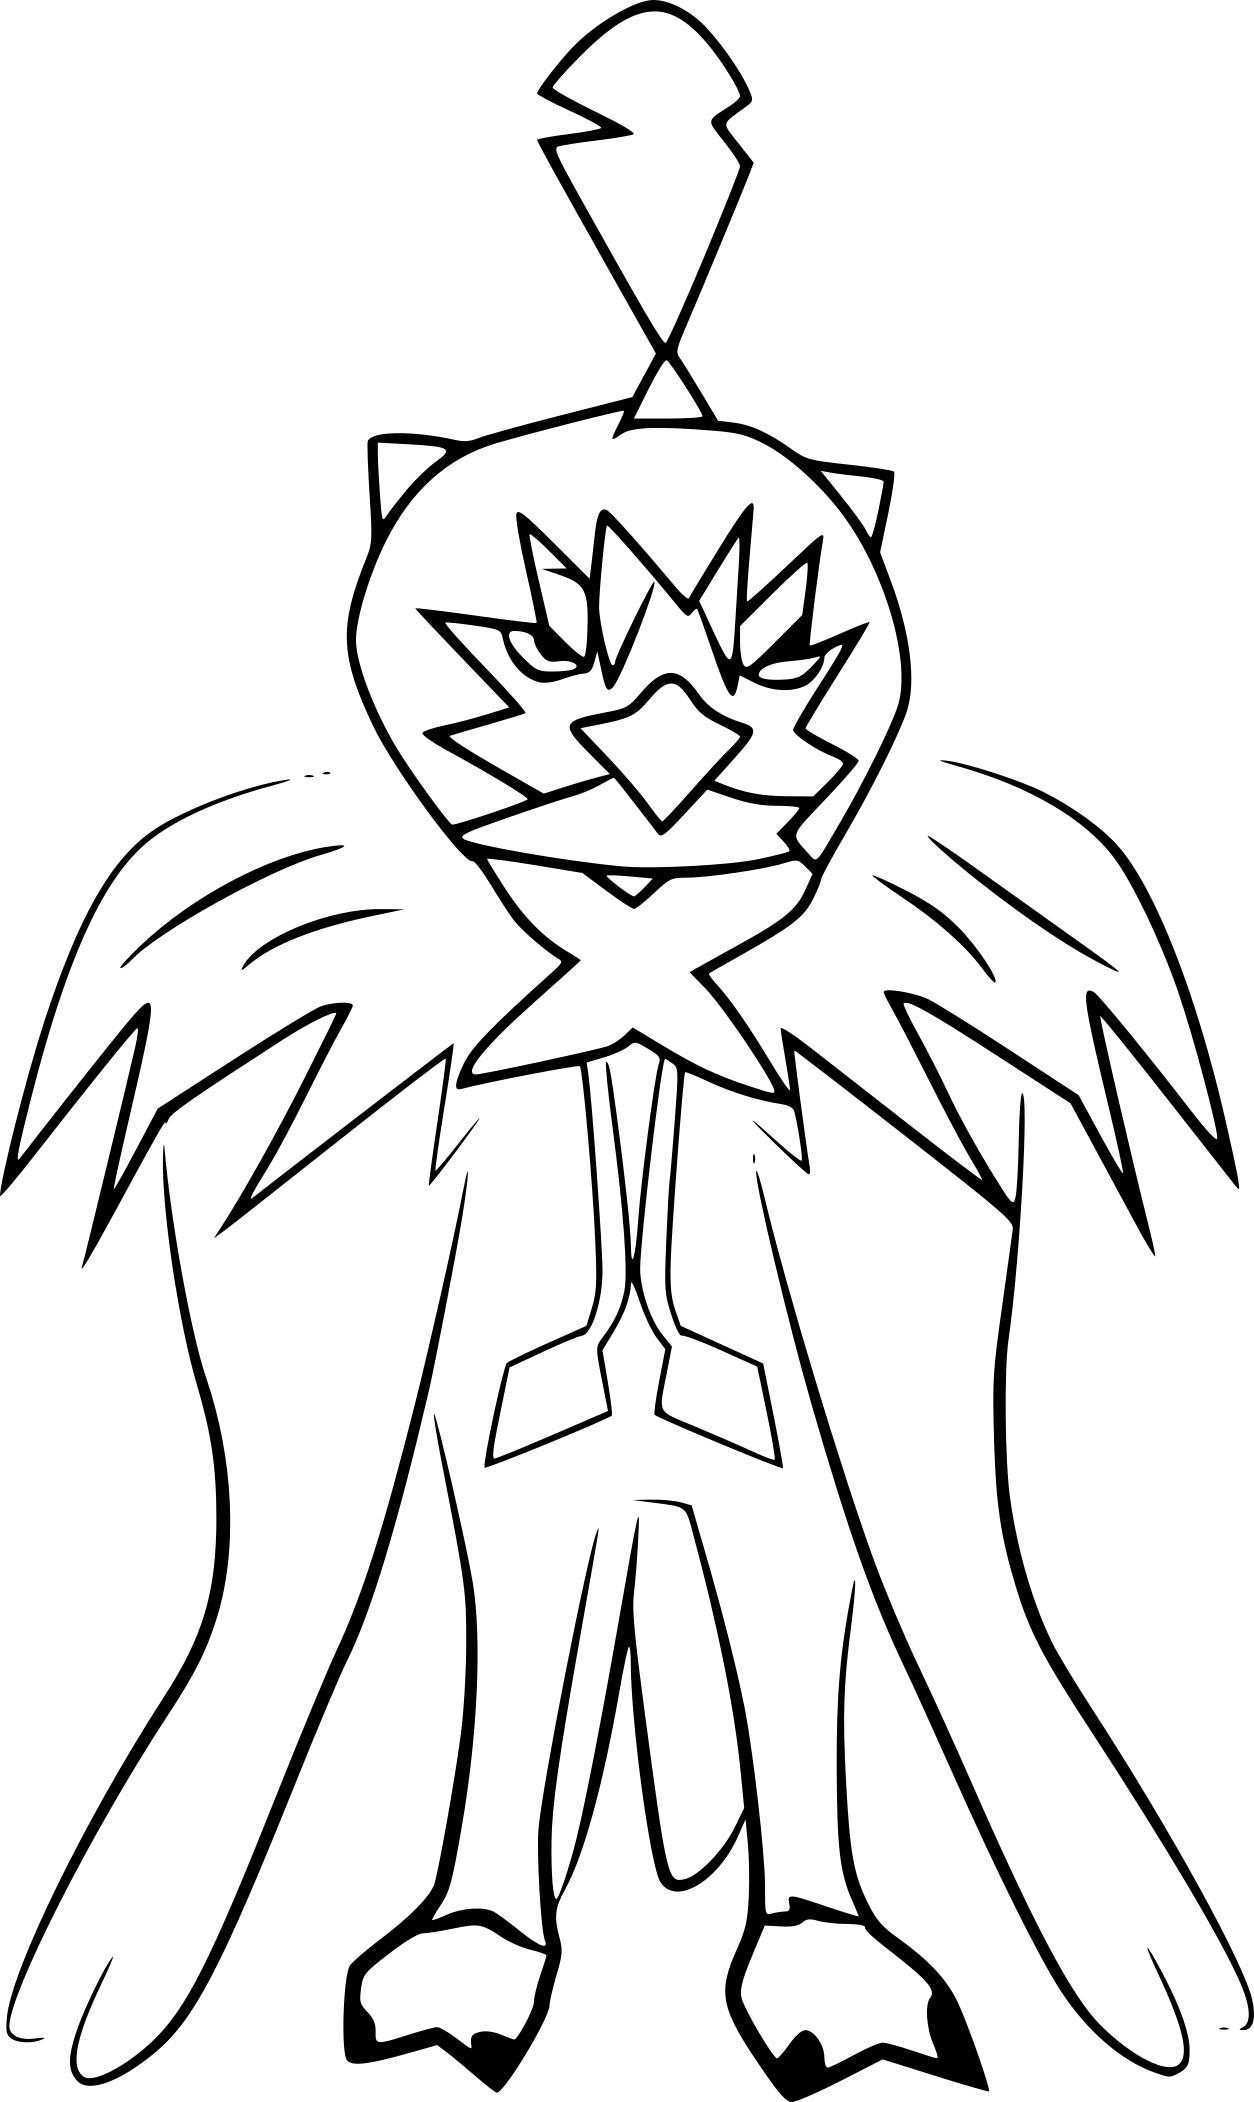 Coloriage arch duc pokemon imprimer - Coloriage pokemon lune ...